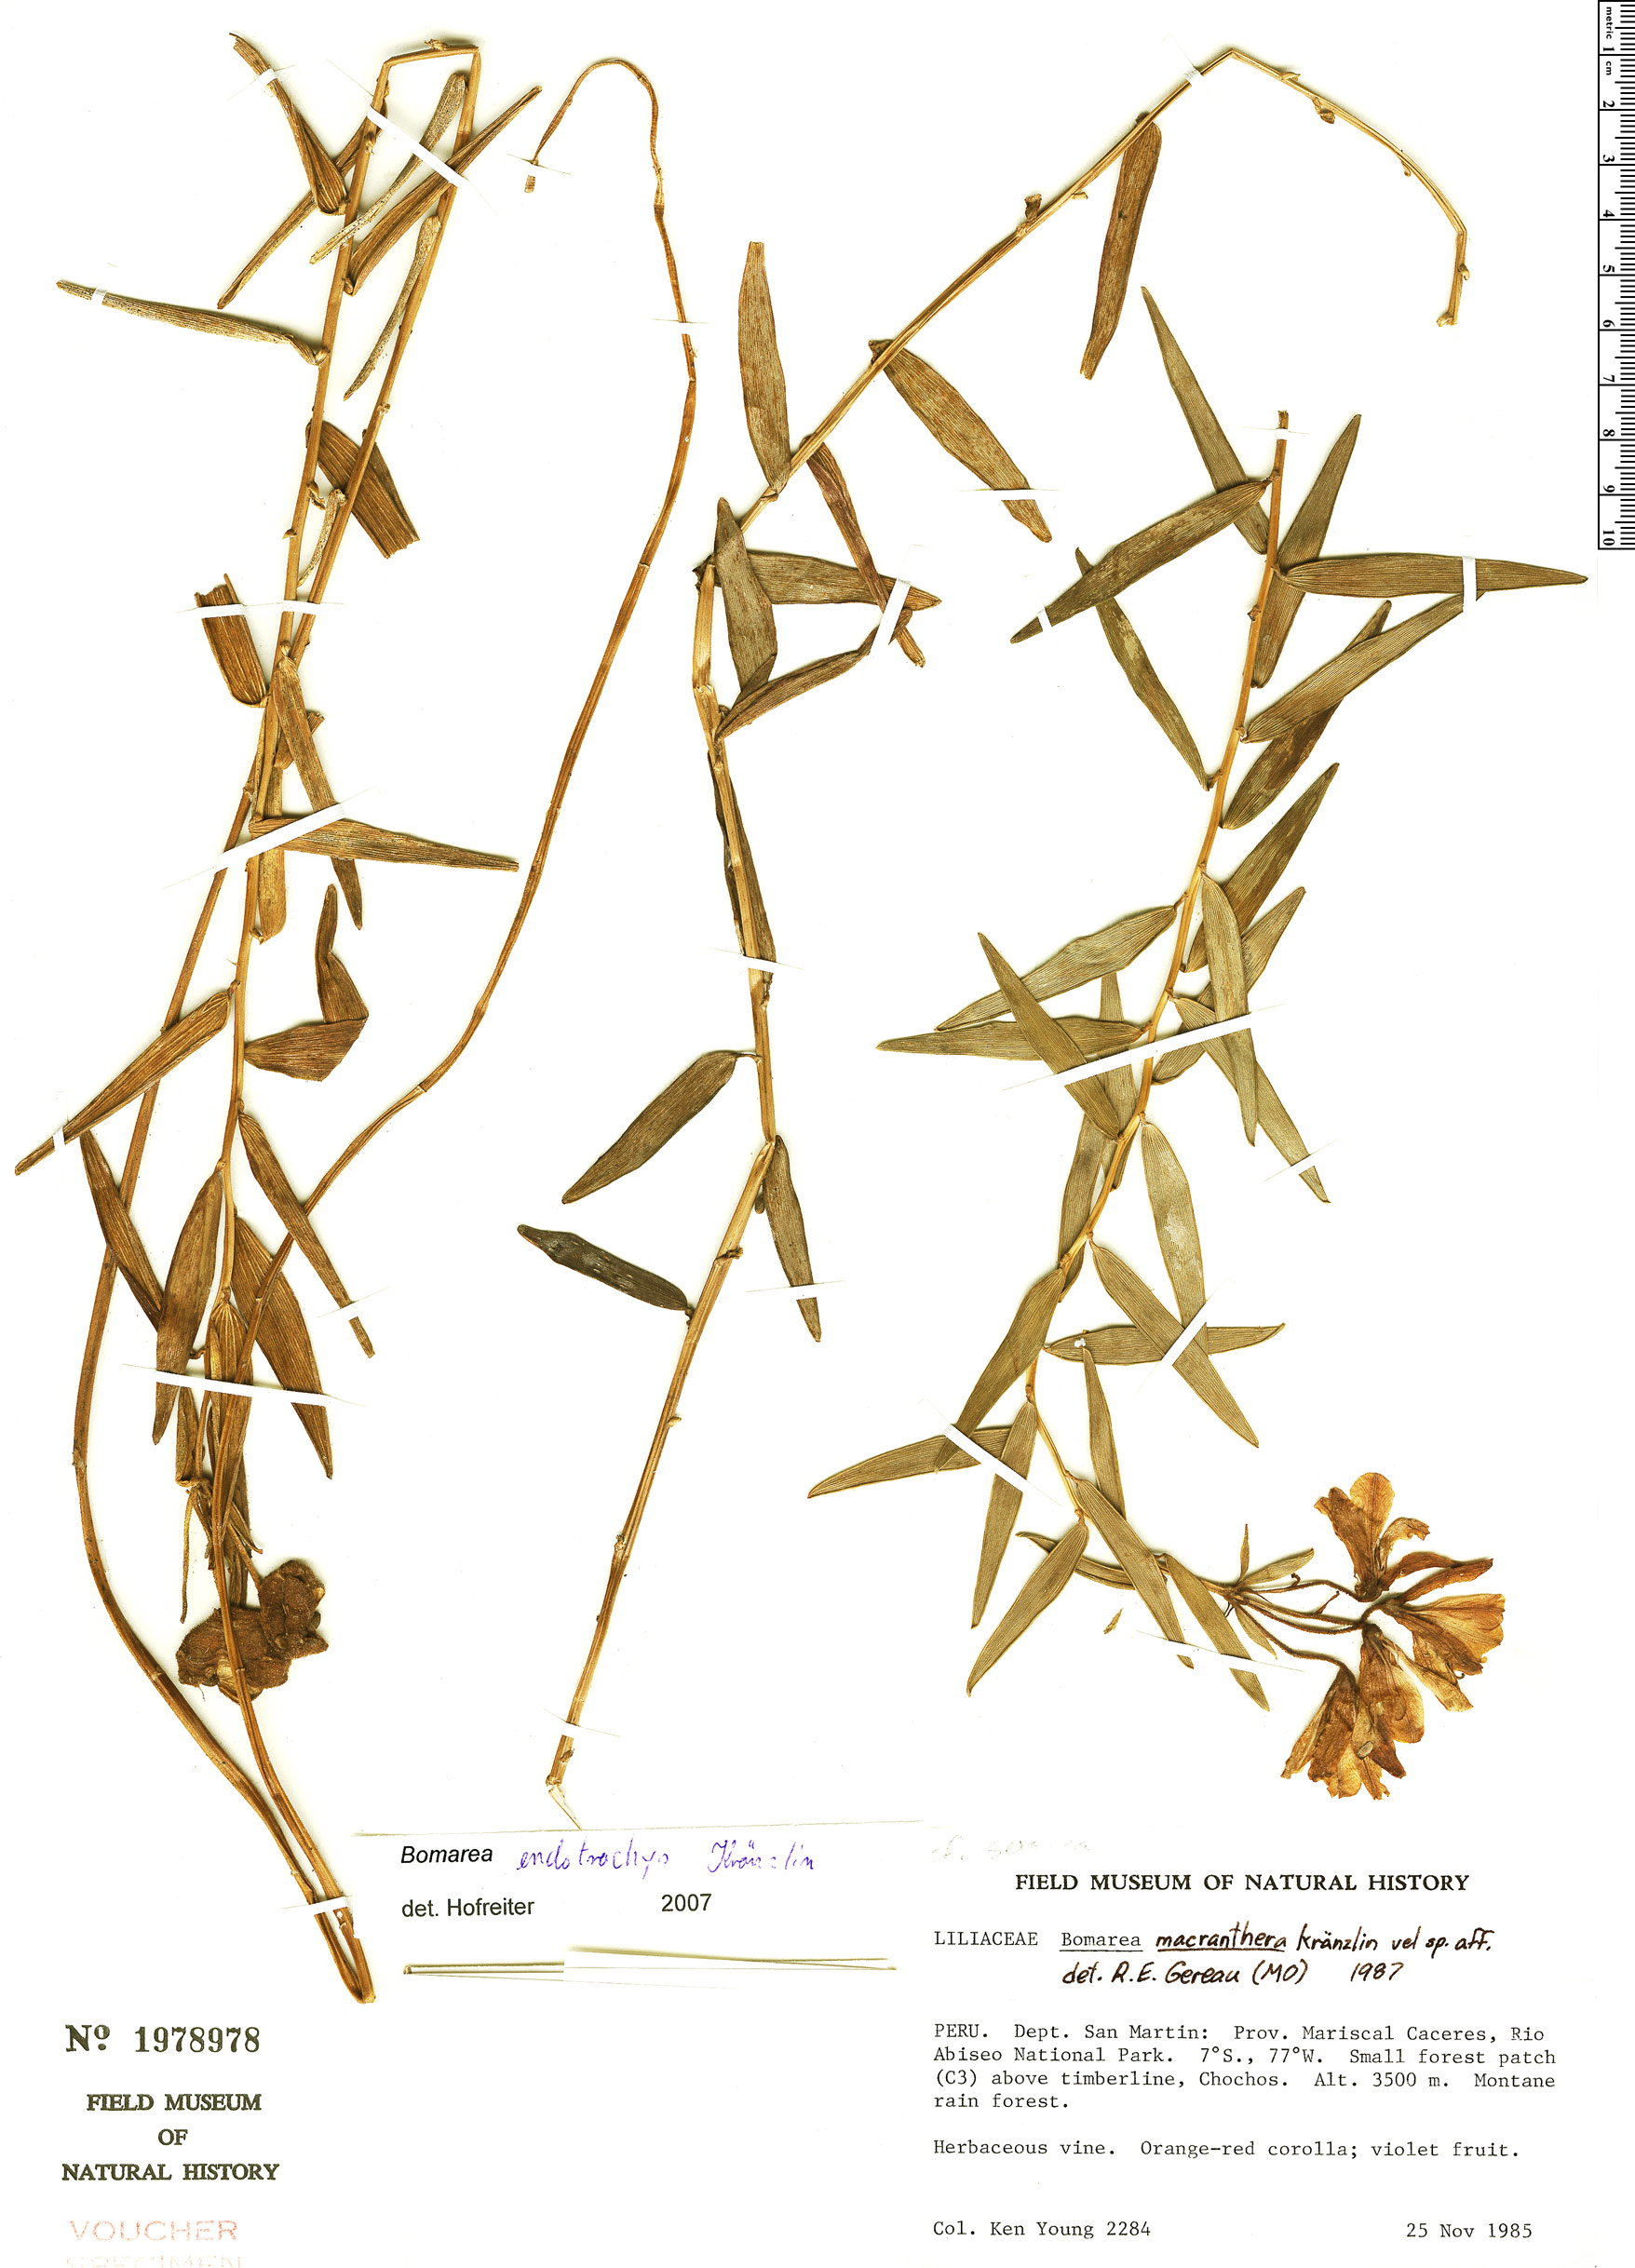 Specimen: Bomarea endotrachys